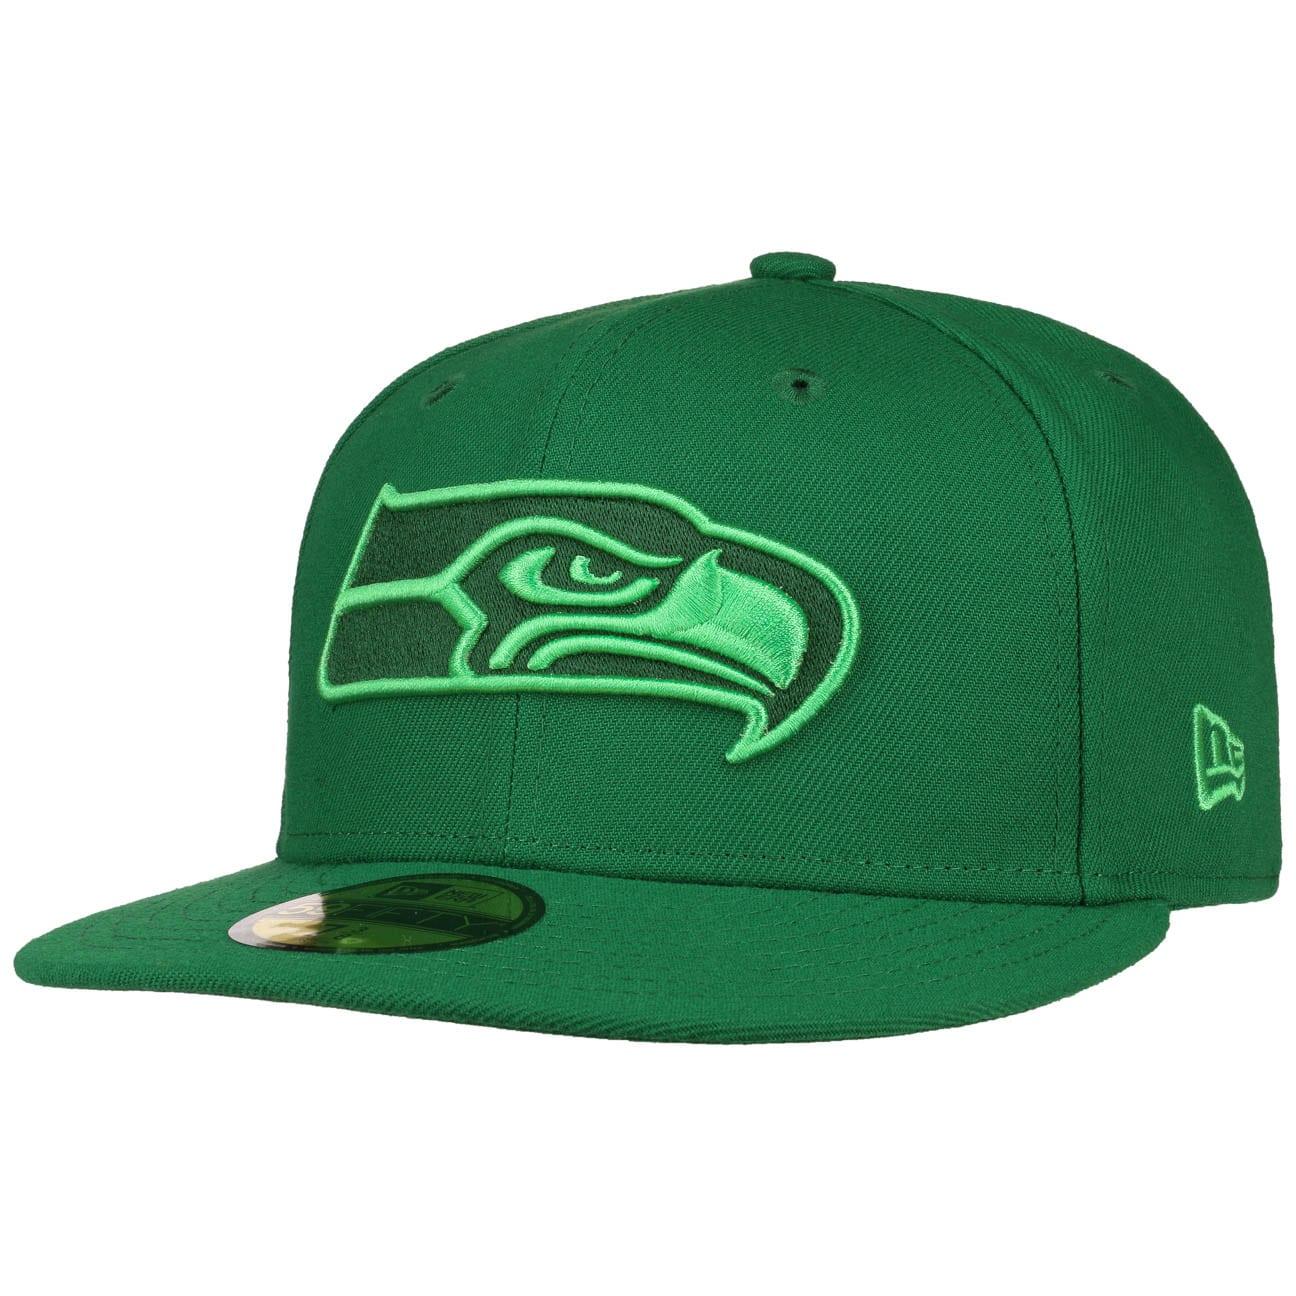 59fifty-pop-seahawks-cap-by-new-era-basecap